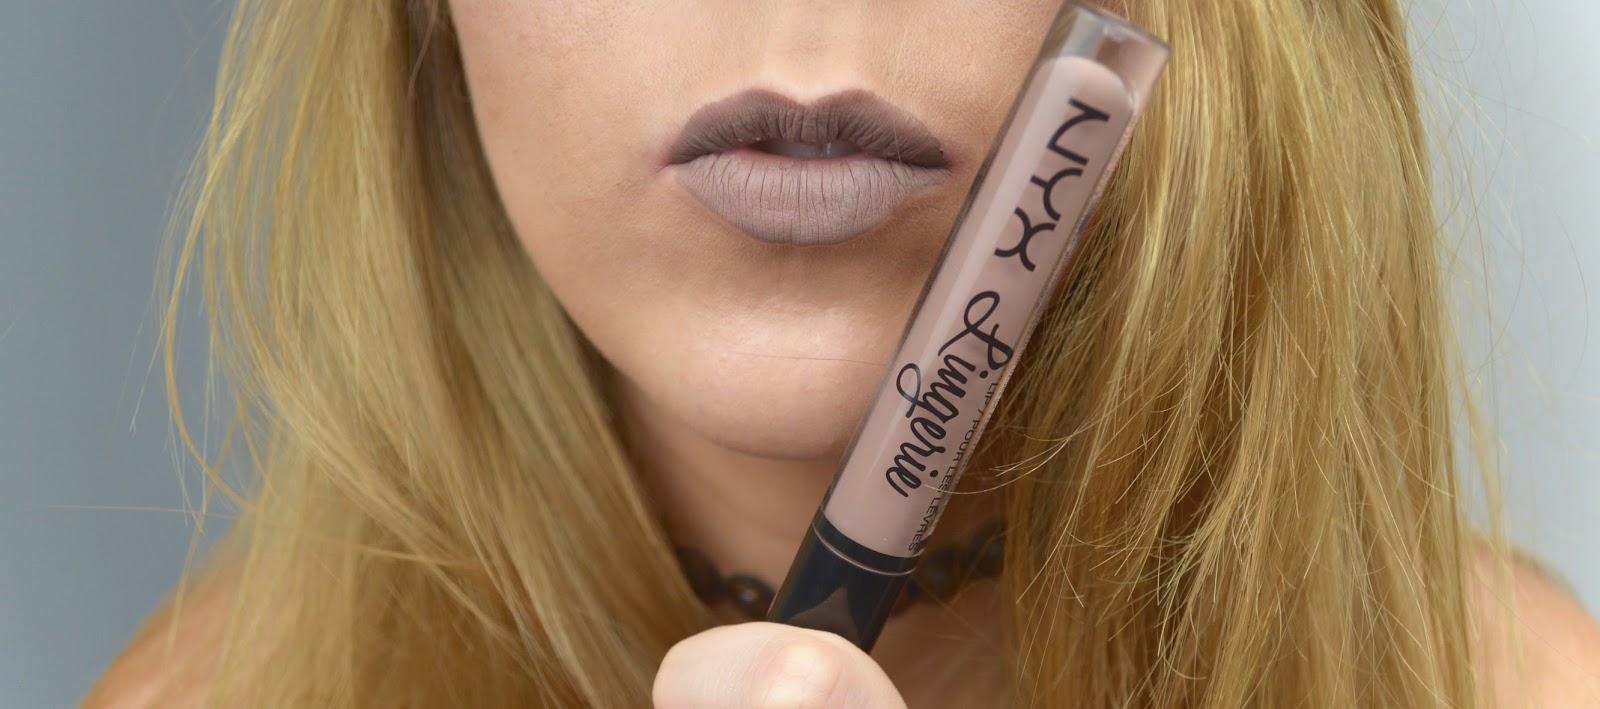 NYX Lip Lingeire, Nude Lip, Nude Lipstick, NYX Lip Lingeire Honeymoon, NYX Lip Lingeire Bedtime Flirt, NYX Lip Lingeire Exotic, NYX Lip Lingeire Embellishment, Makeup